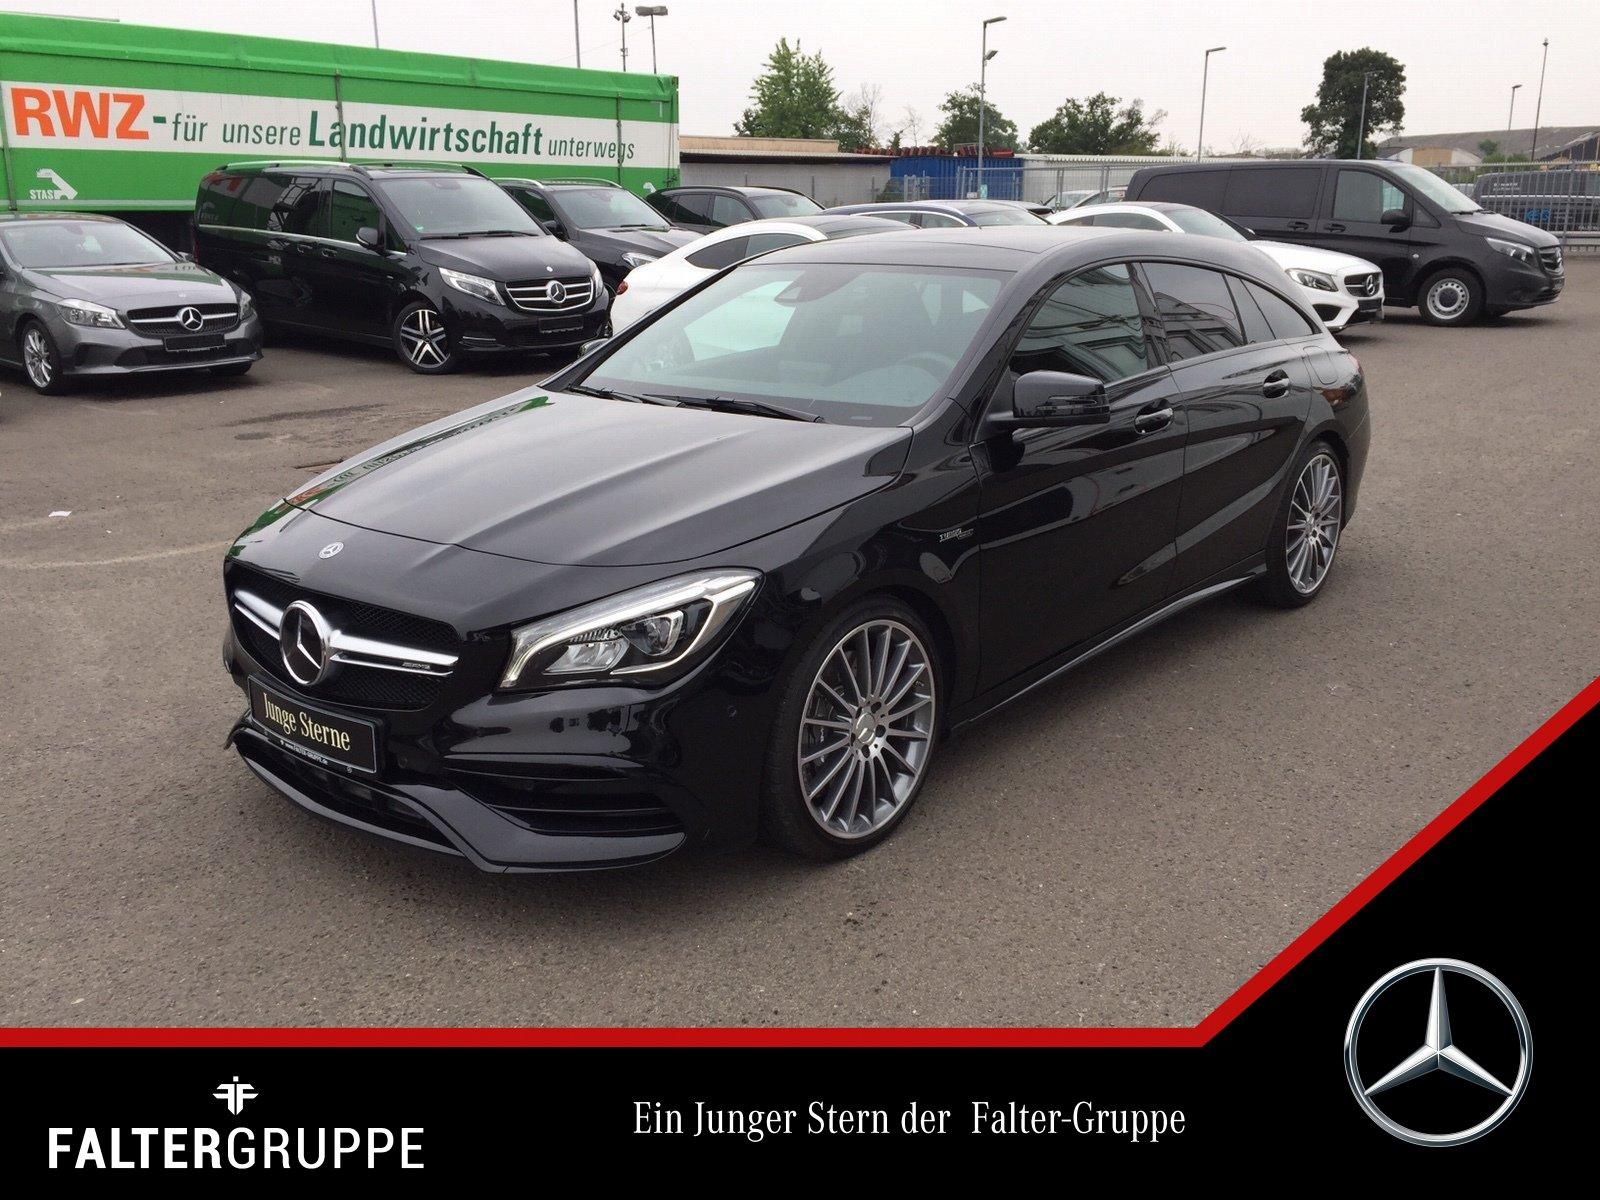 Mercedes-Benz CLA 45 4M SB Night DISTRO Pano LED Comand SpurPk, Jahr 2018, Benzin